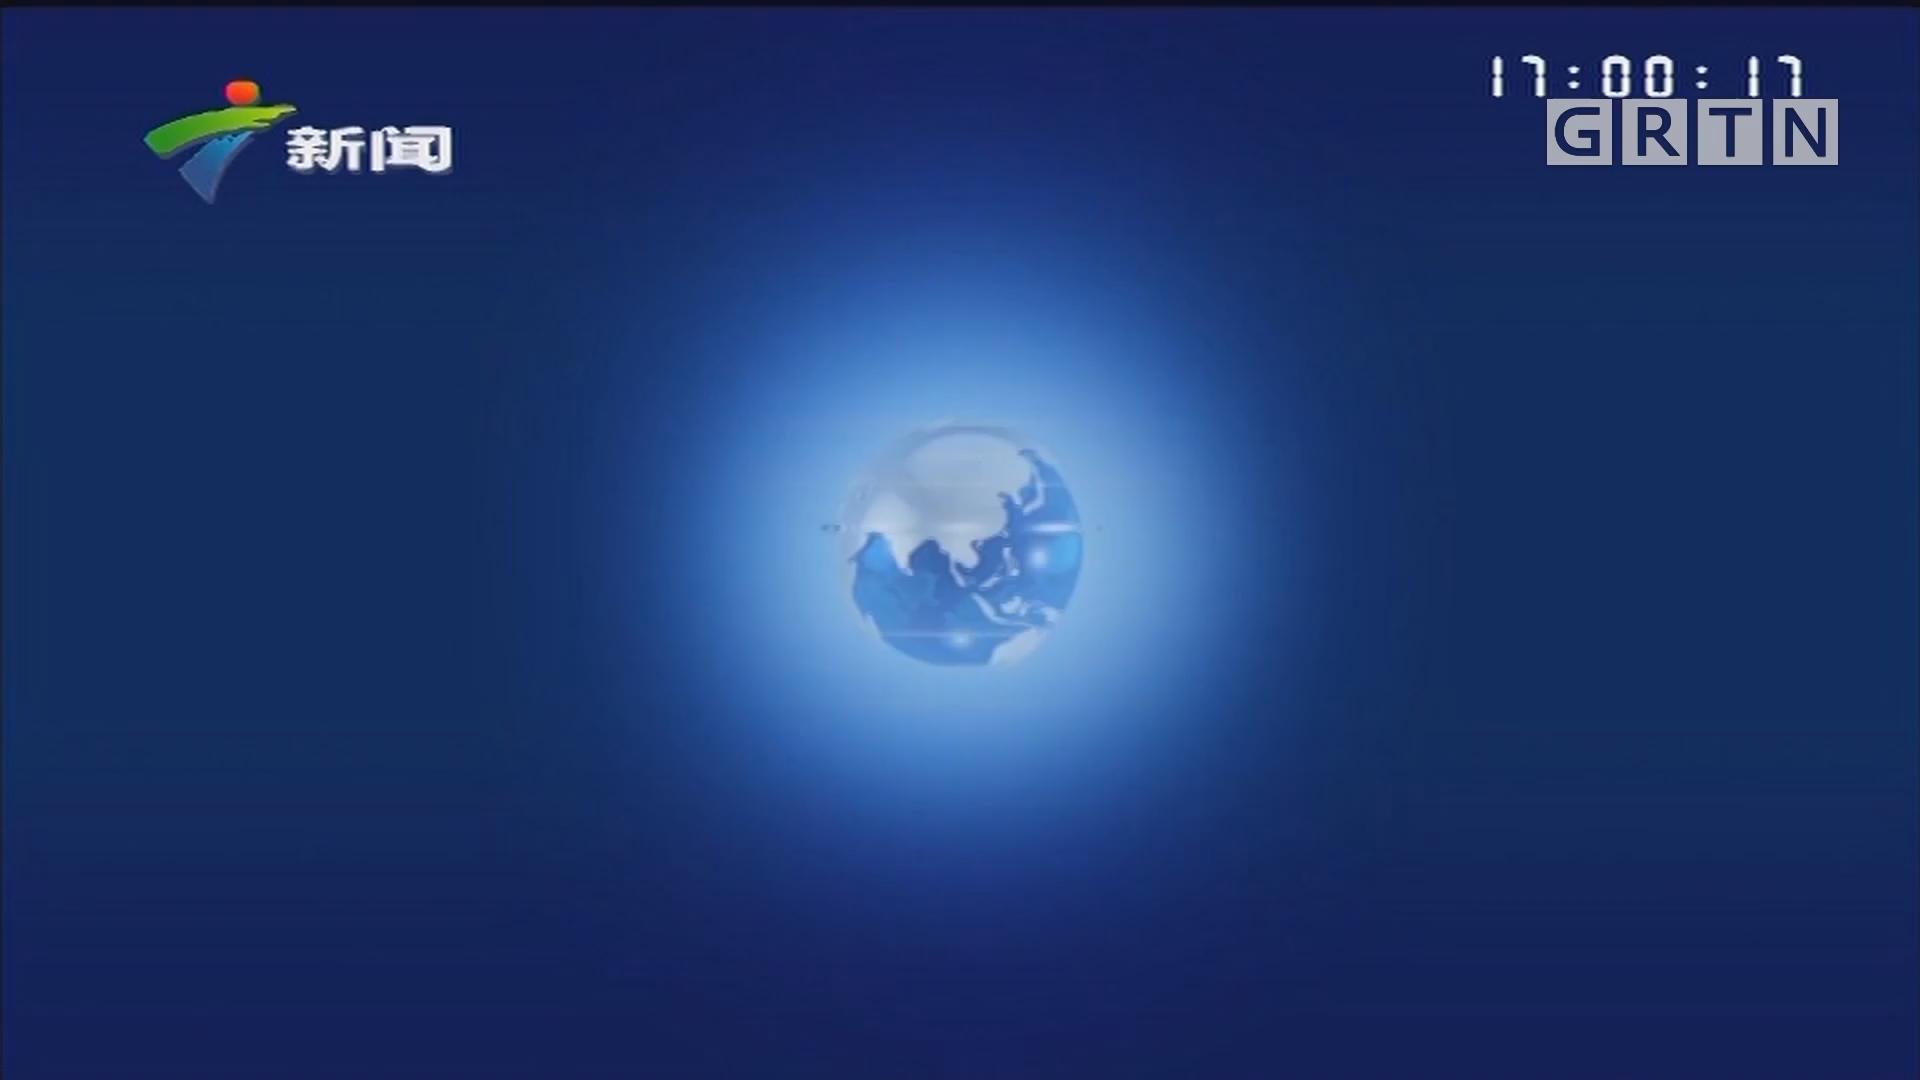 [HD][2019-10-19]正點播報:軍運會25米手槍軍事速射男團中國隊摘首金